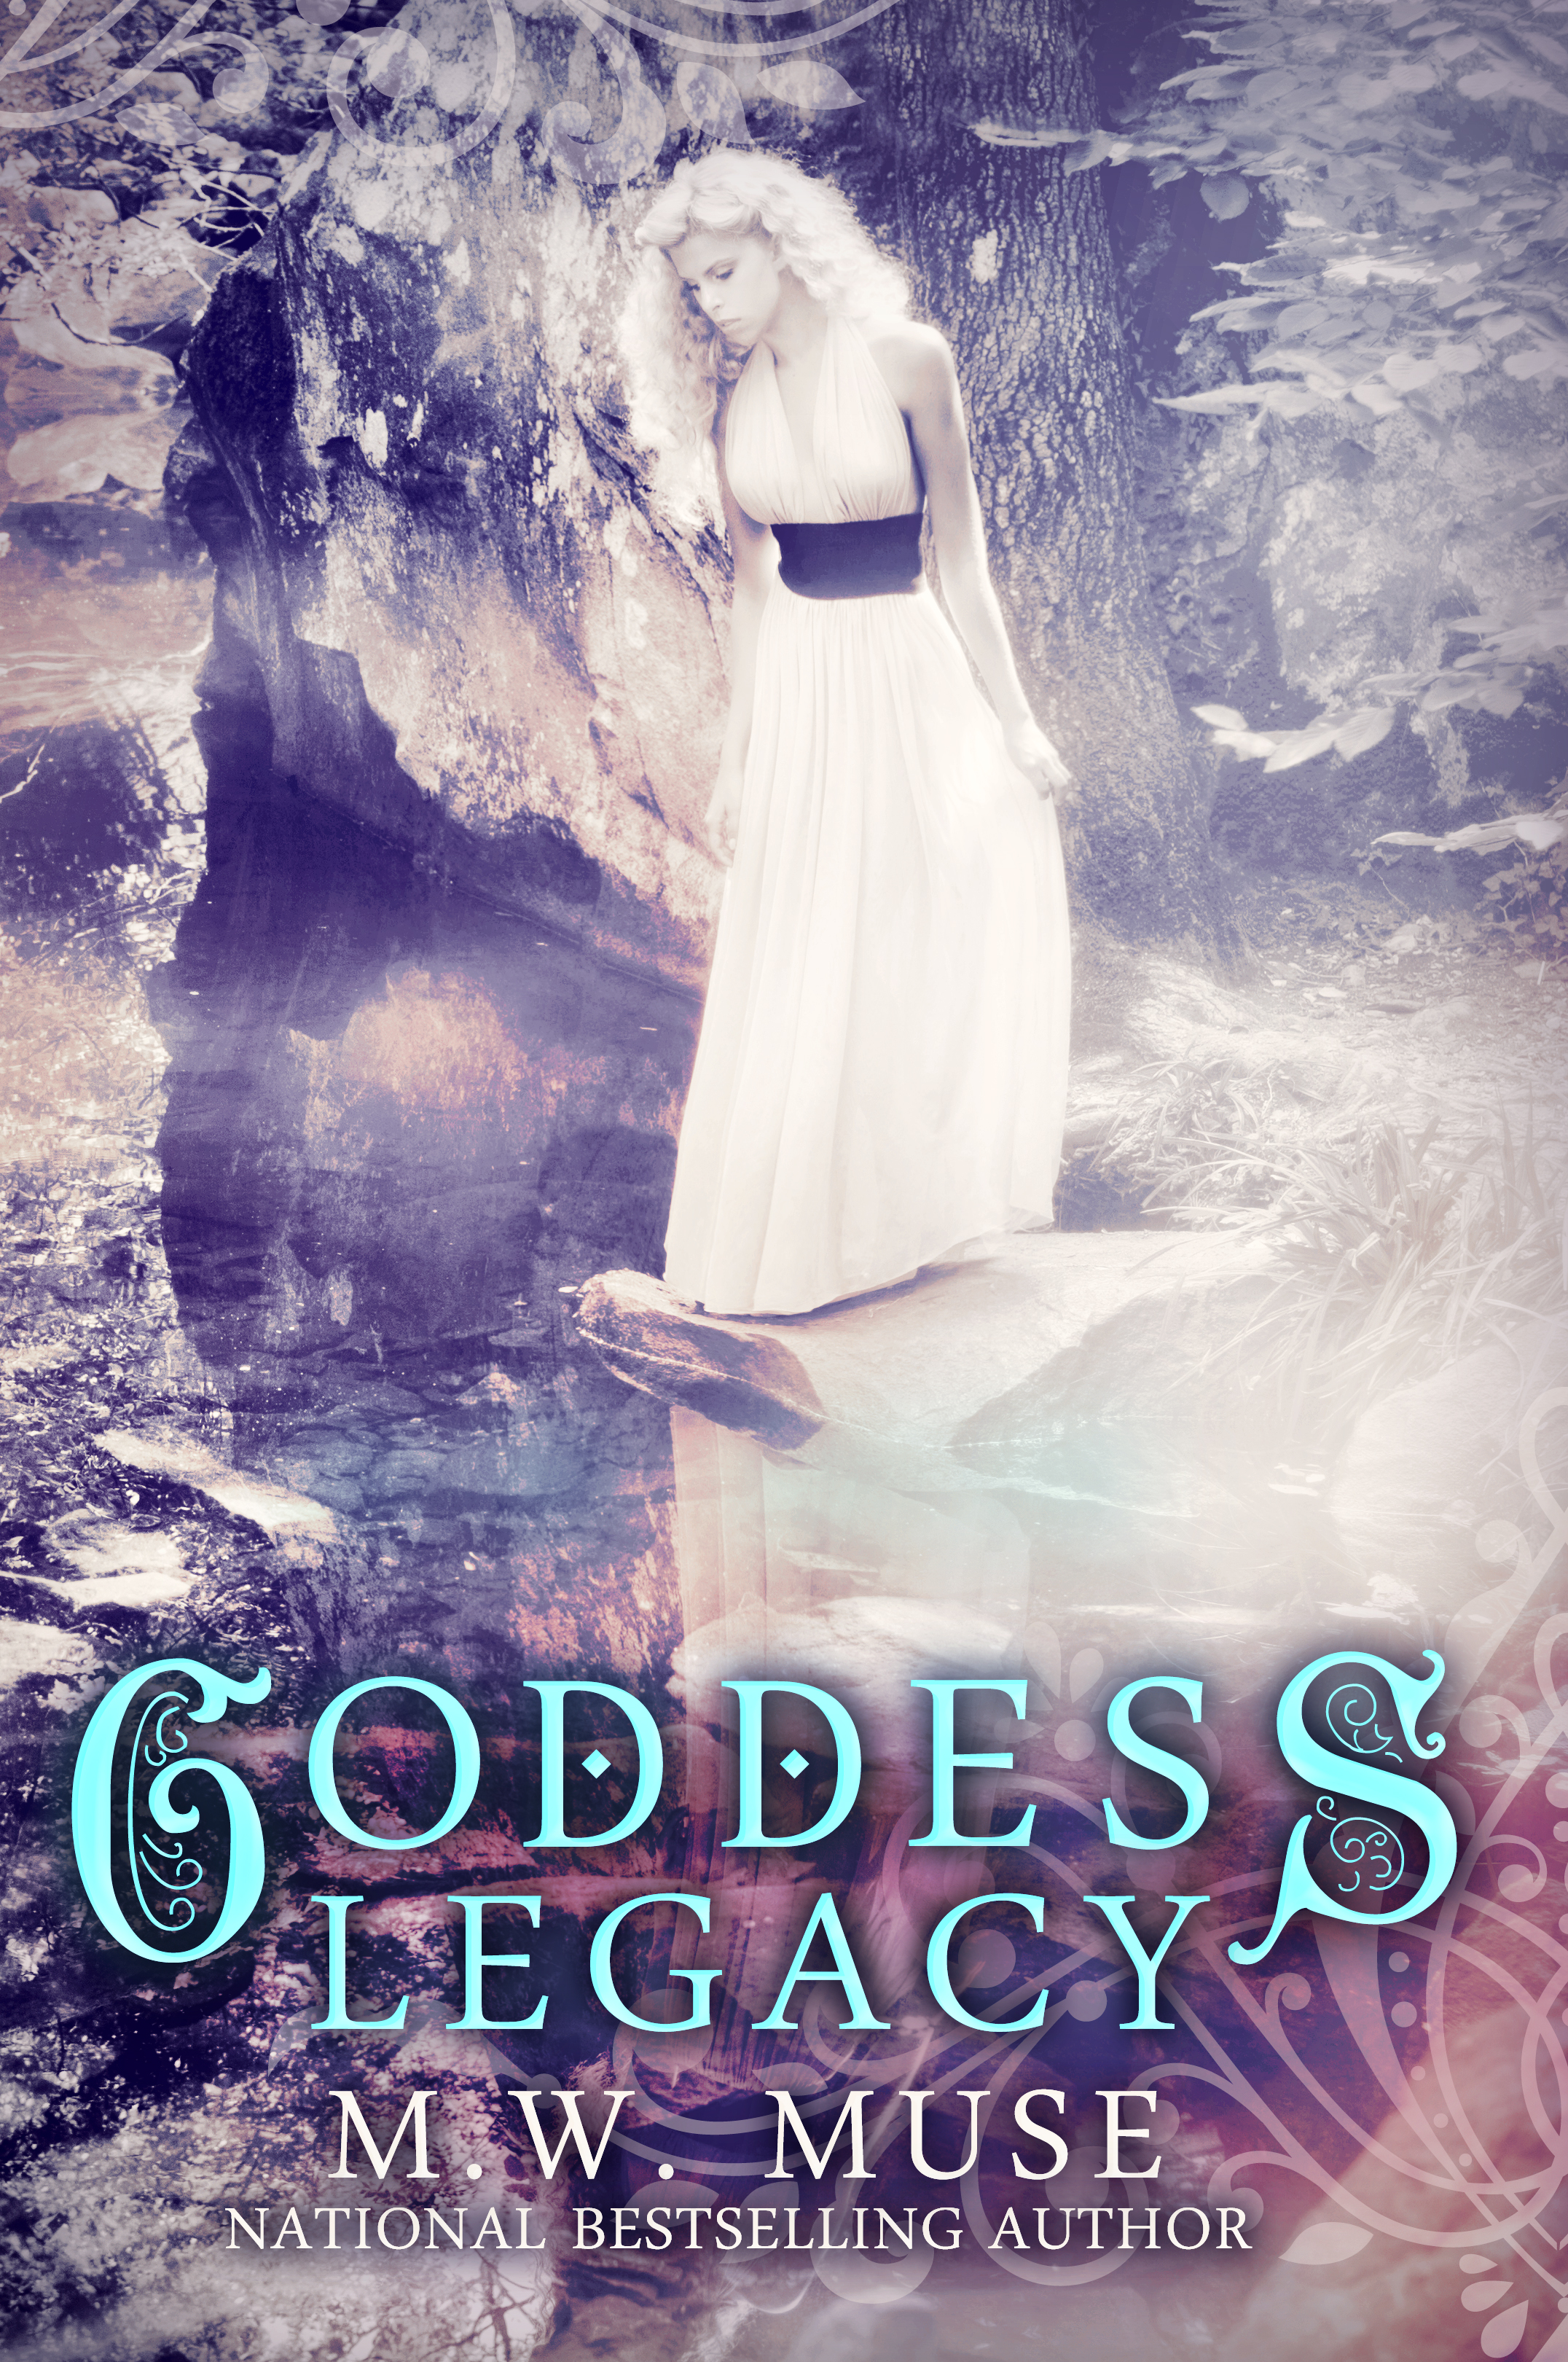 M.W. Muse - Goddess Legacy